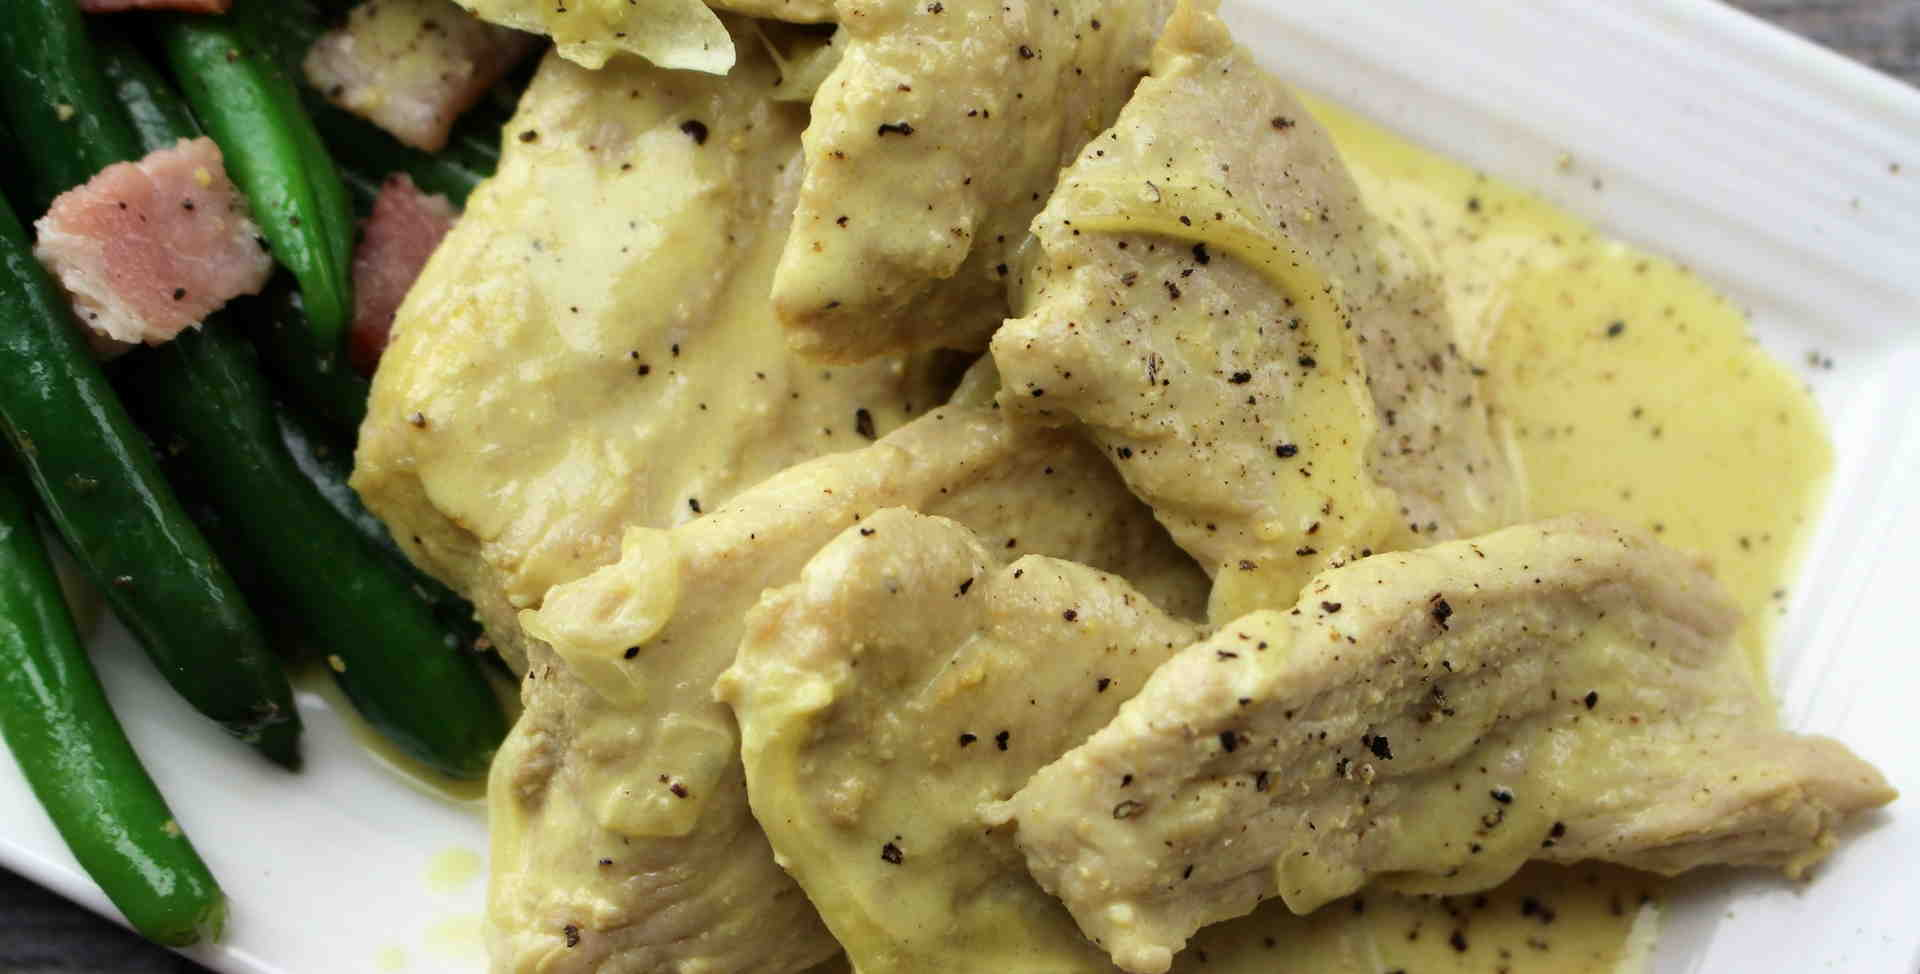 German Pork Tenderloin with Mustard Sauce